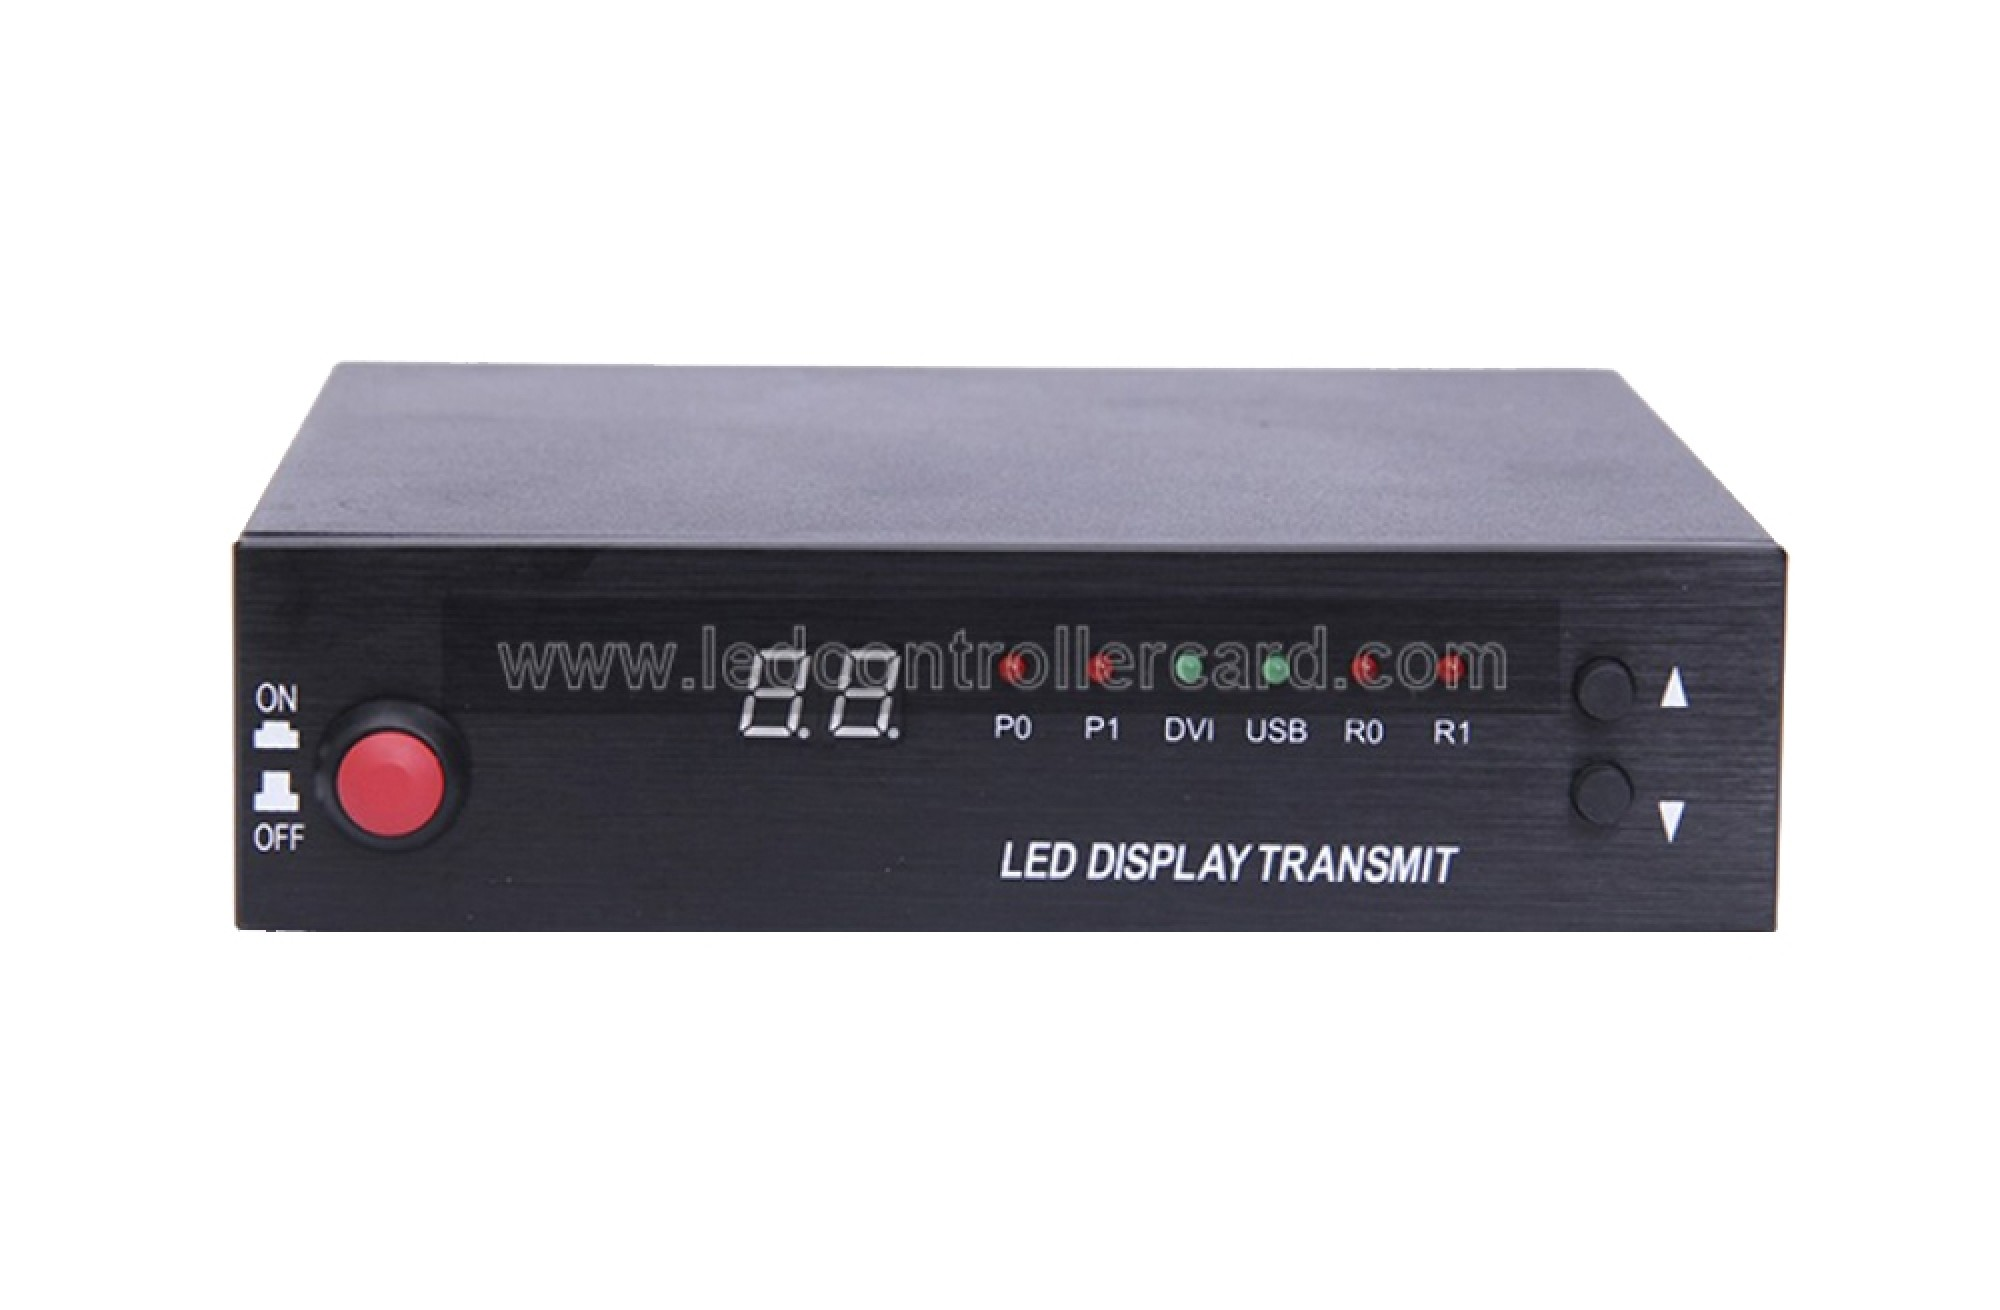 Mooncell 1 Embed Card LED Display Transmitter Sending Box